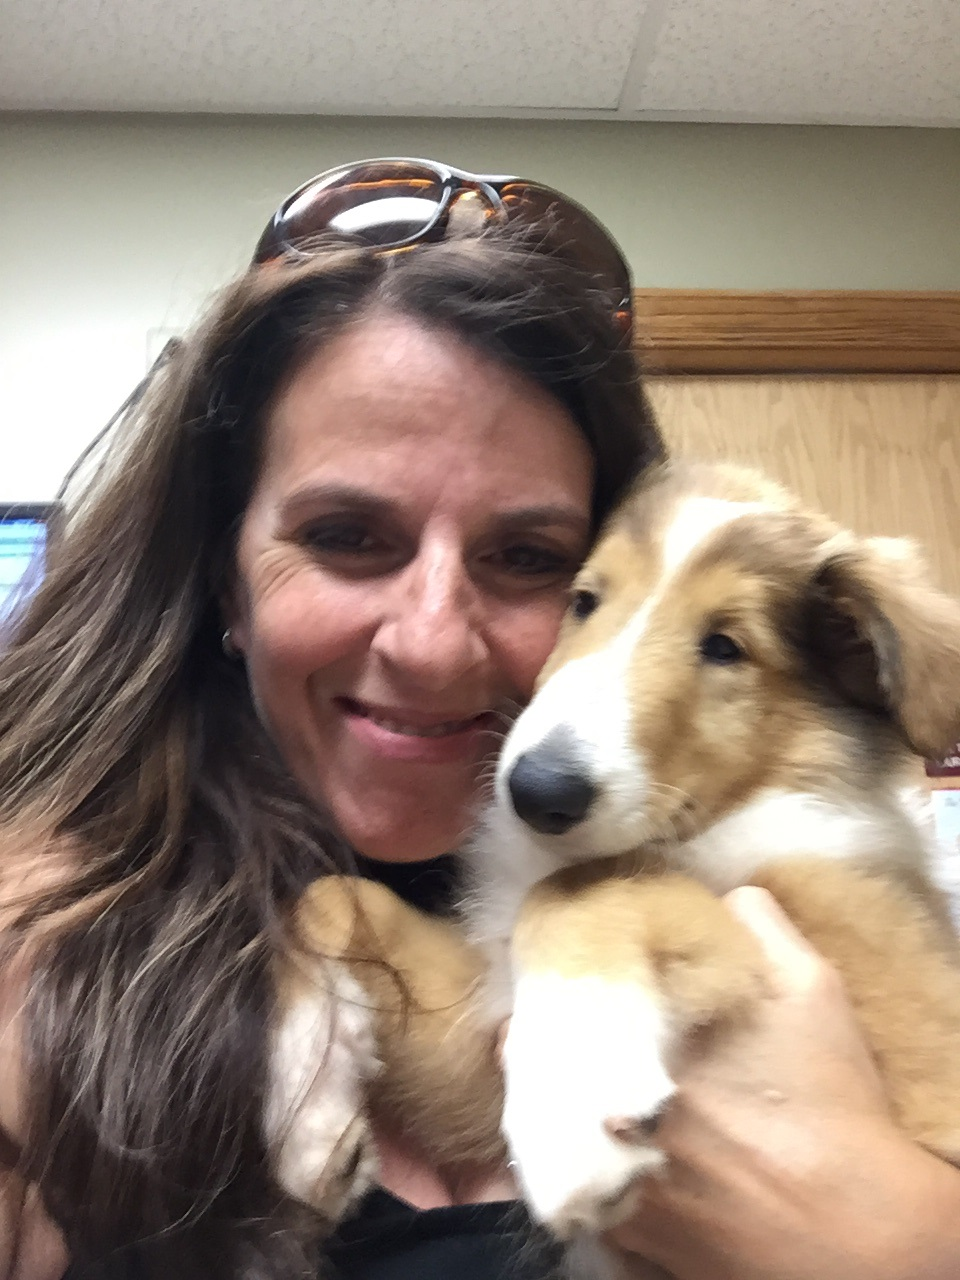 Oakton-Vienna Veterinary Hospital - Vienna, VA - Our bookkeeper Linda